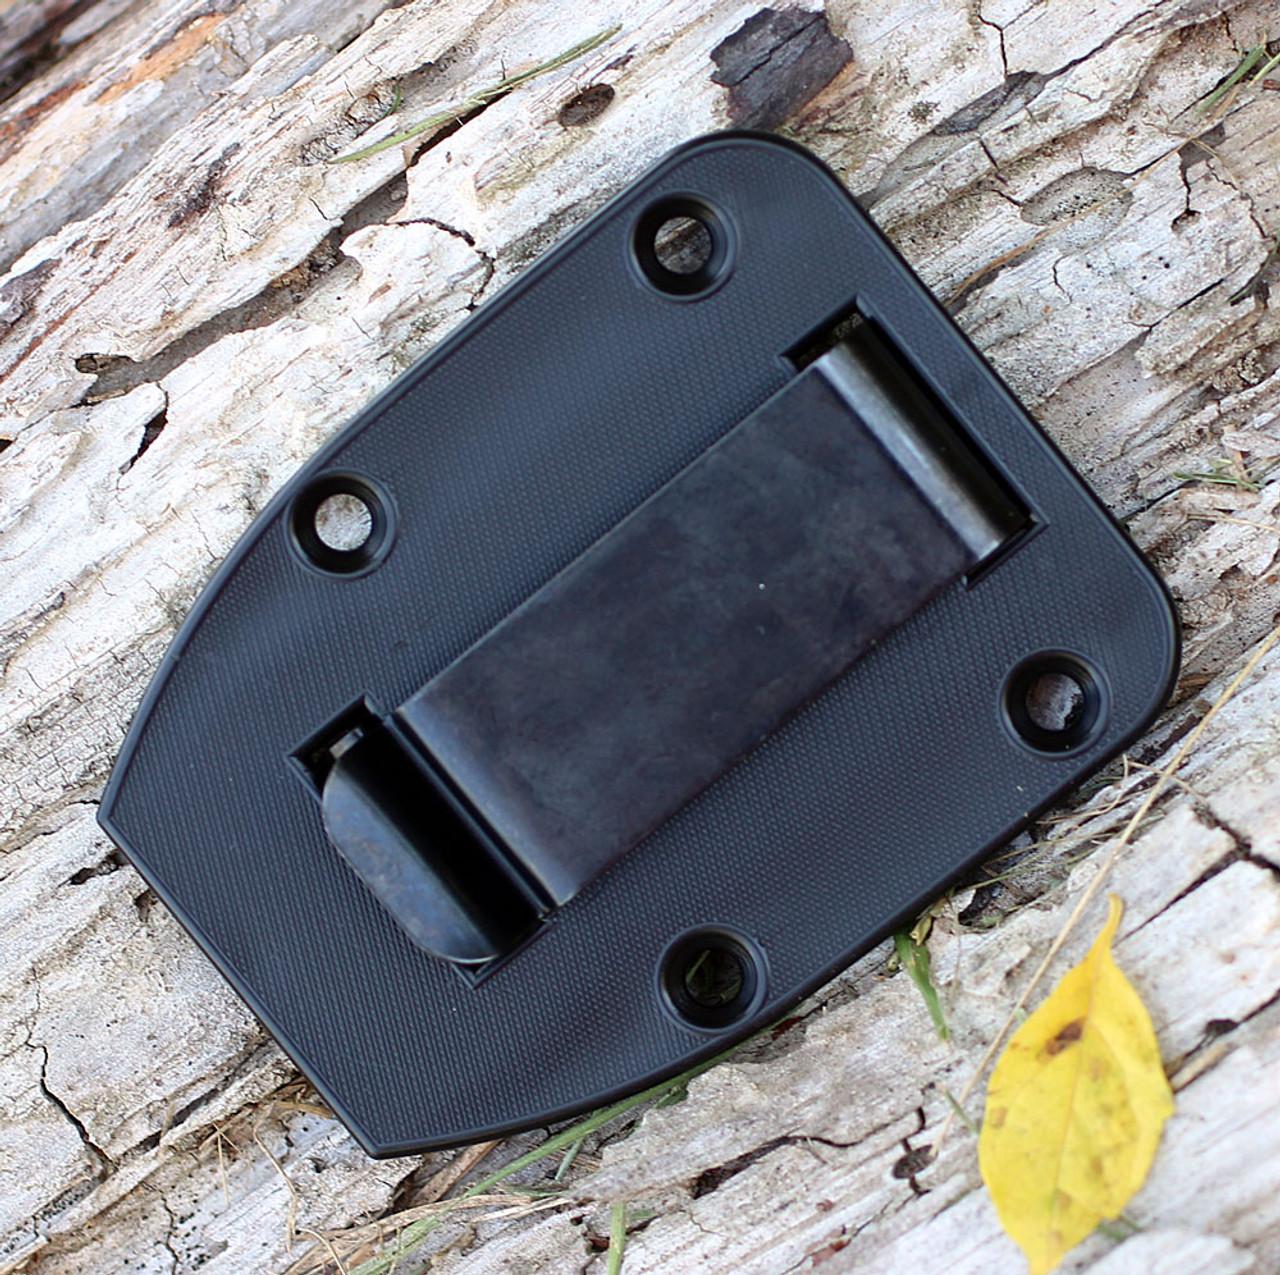 ESEE 4HM, Black Plain Edge, Modified Canvas Handles, Kydex Sheath